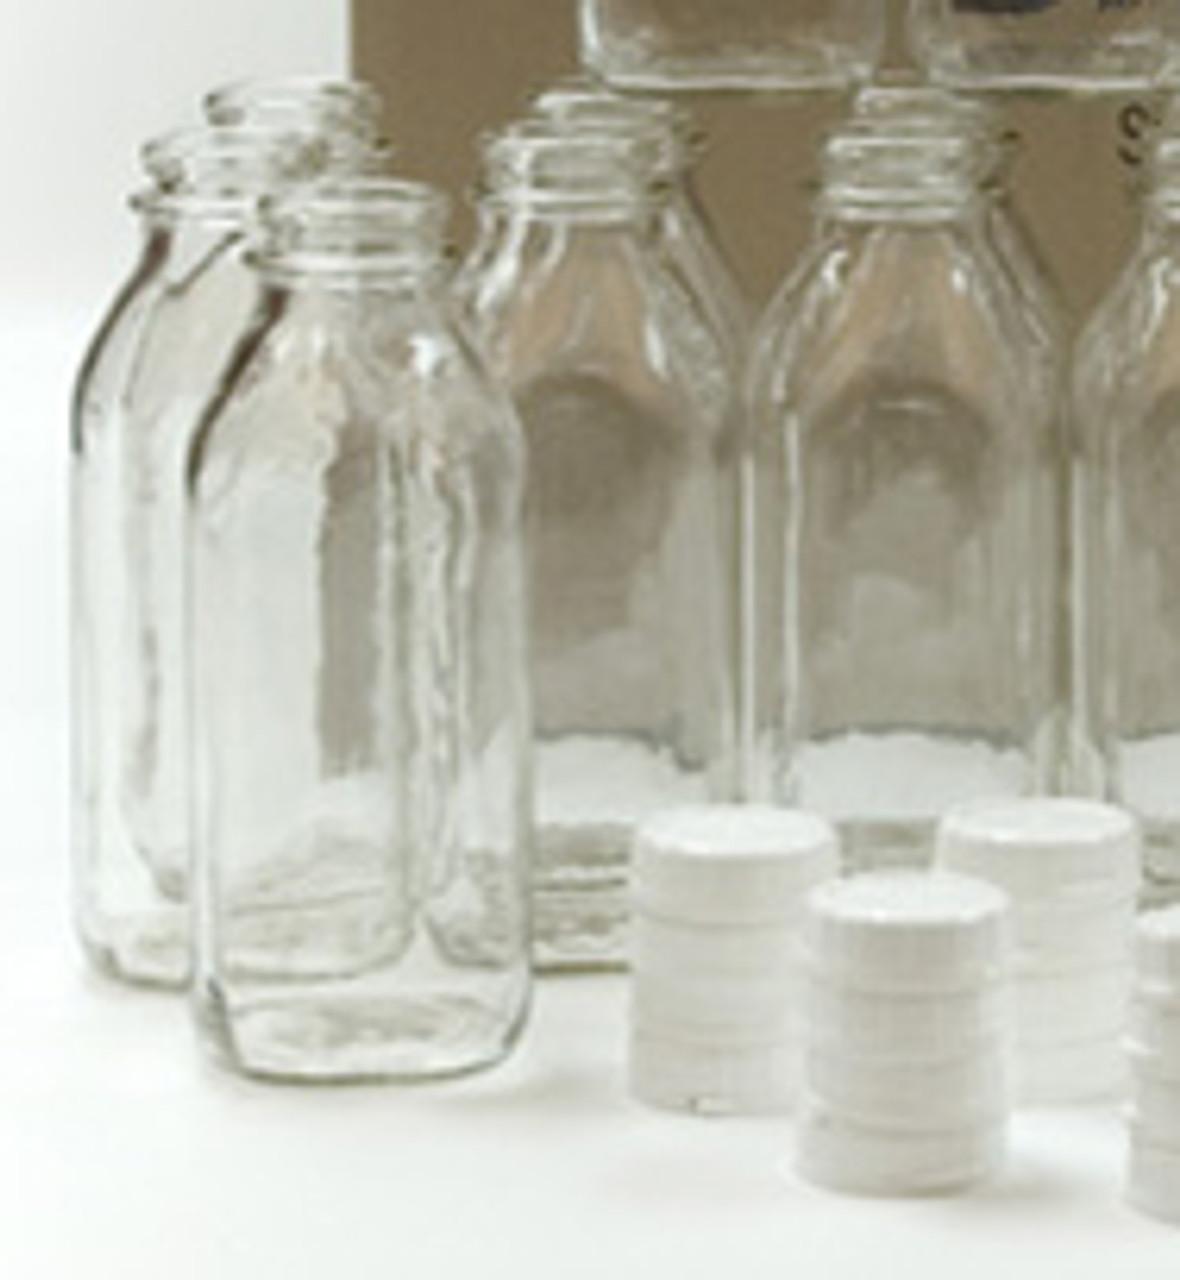 Glass Quart Milk Bottle with Lid - 32oz